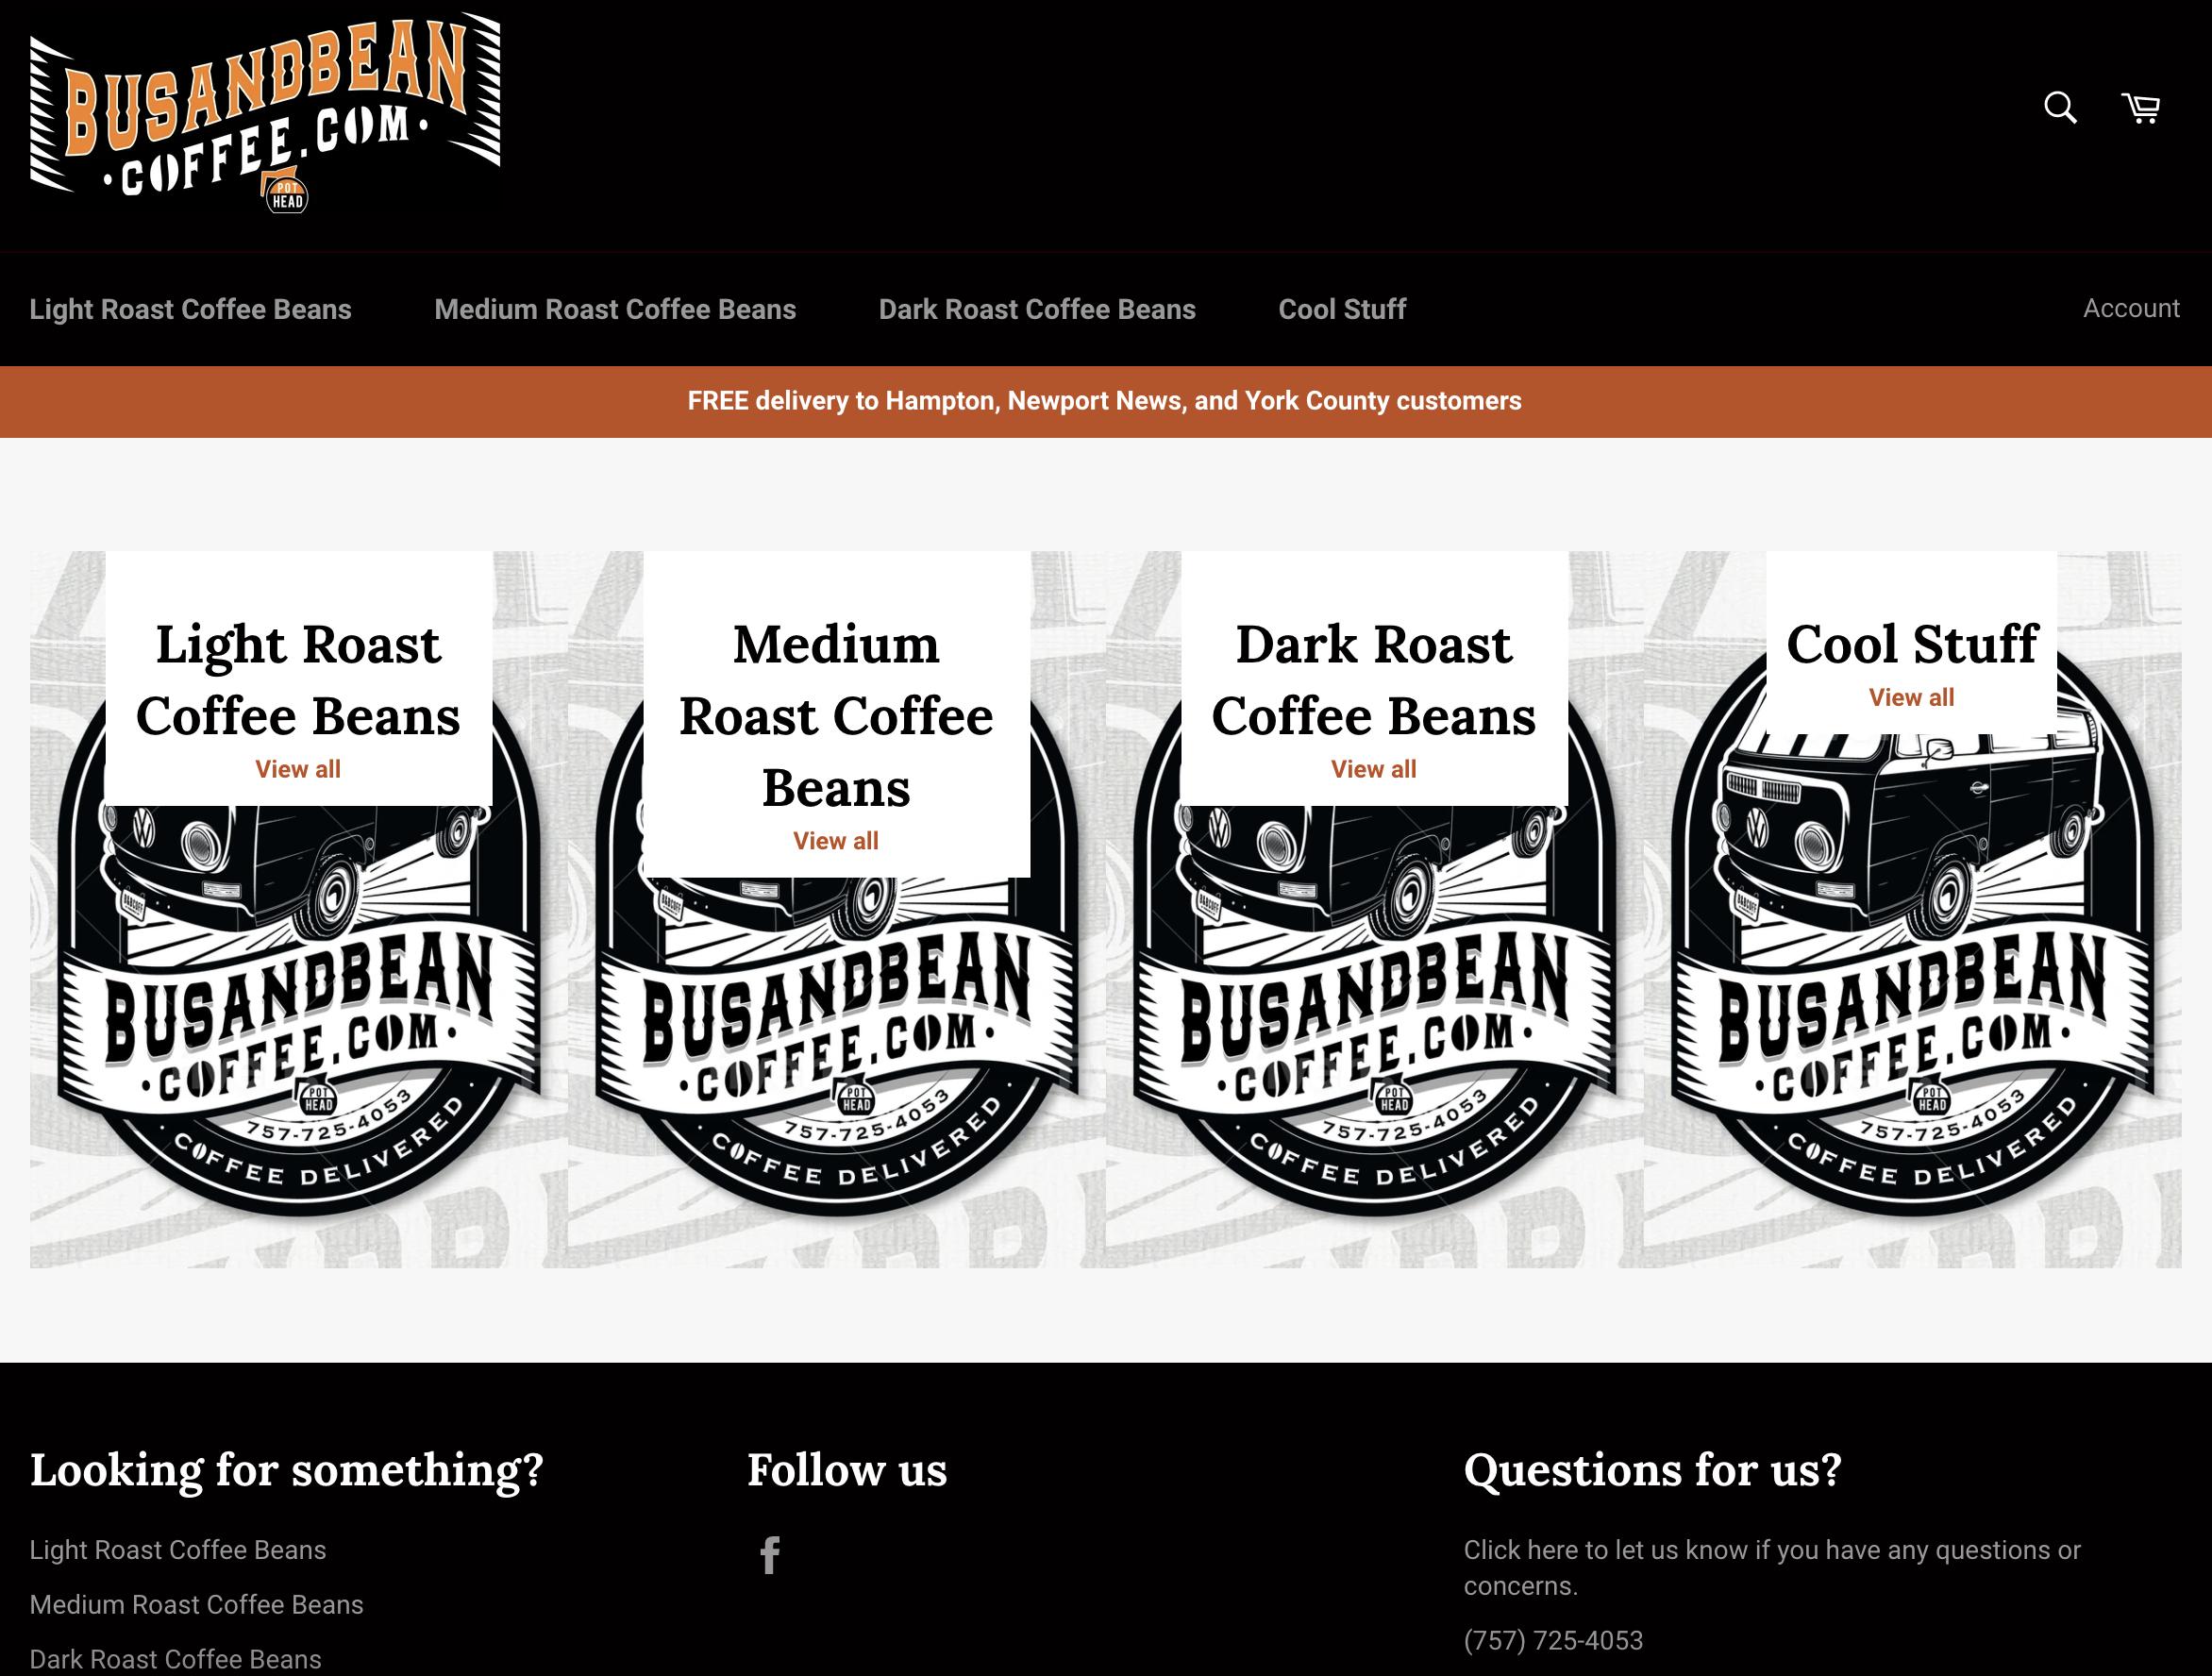 Bus & Bean Coffee website